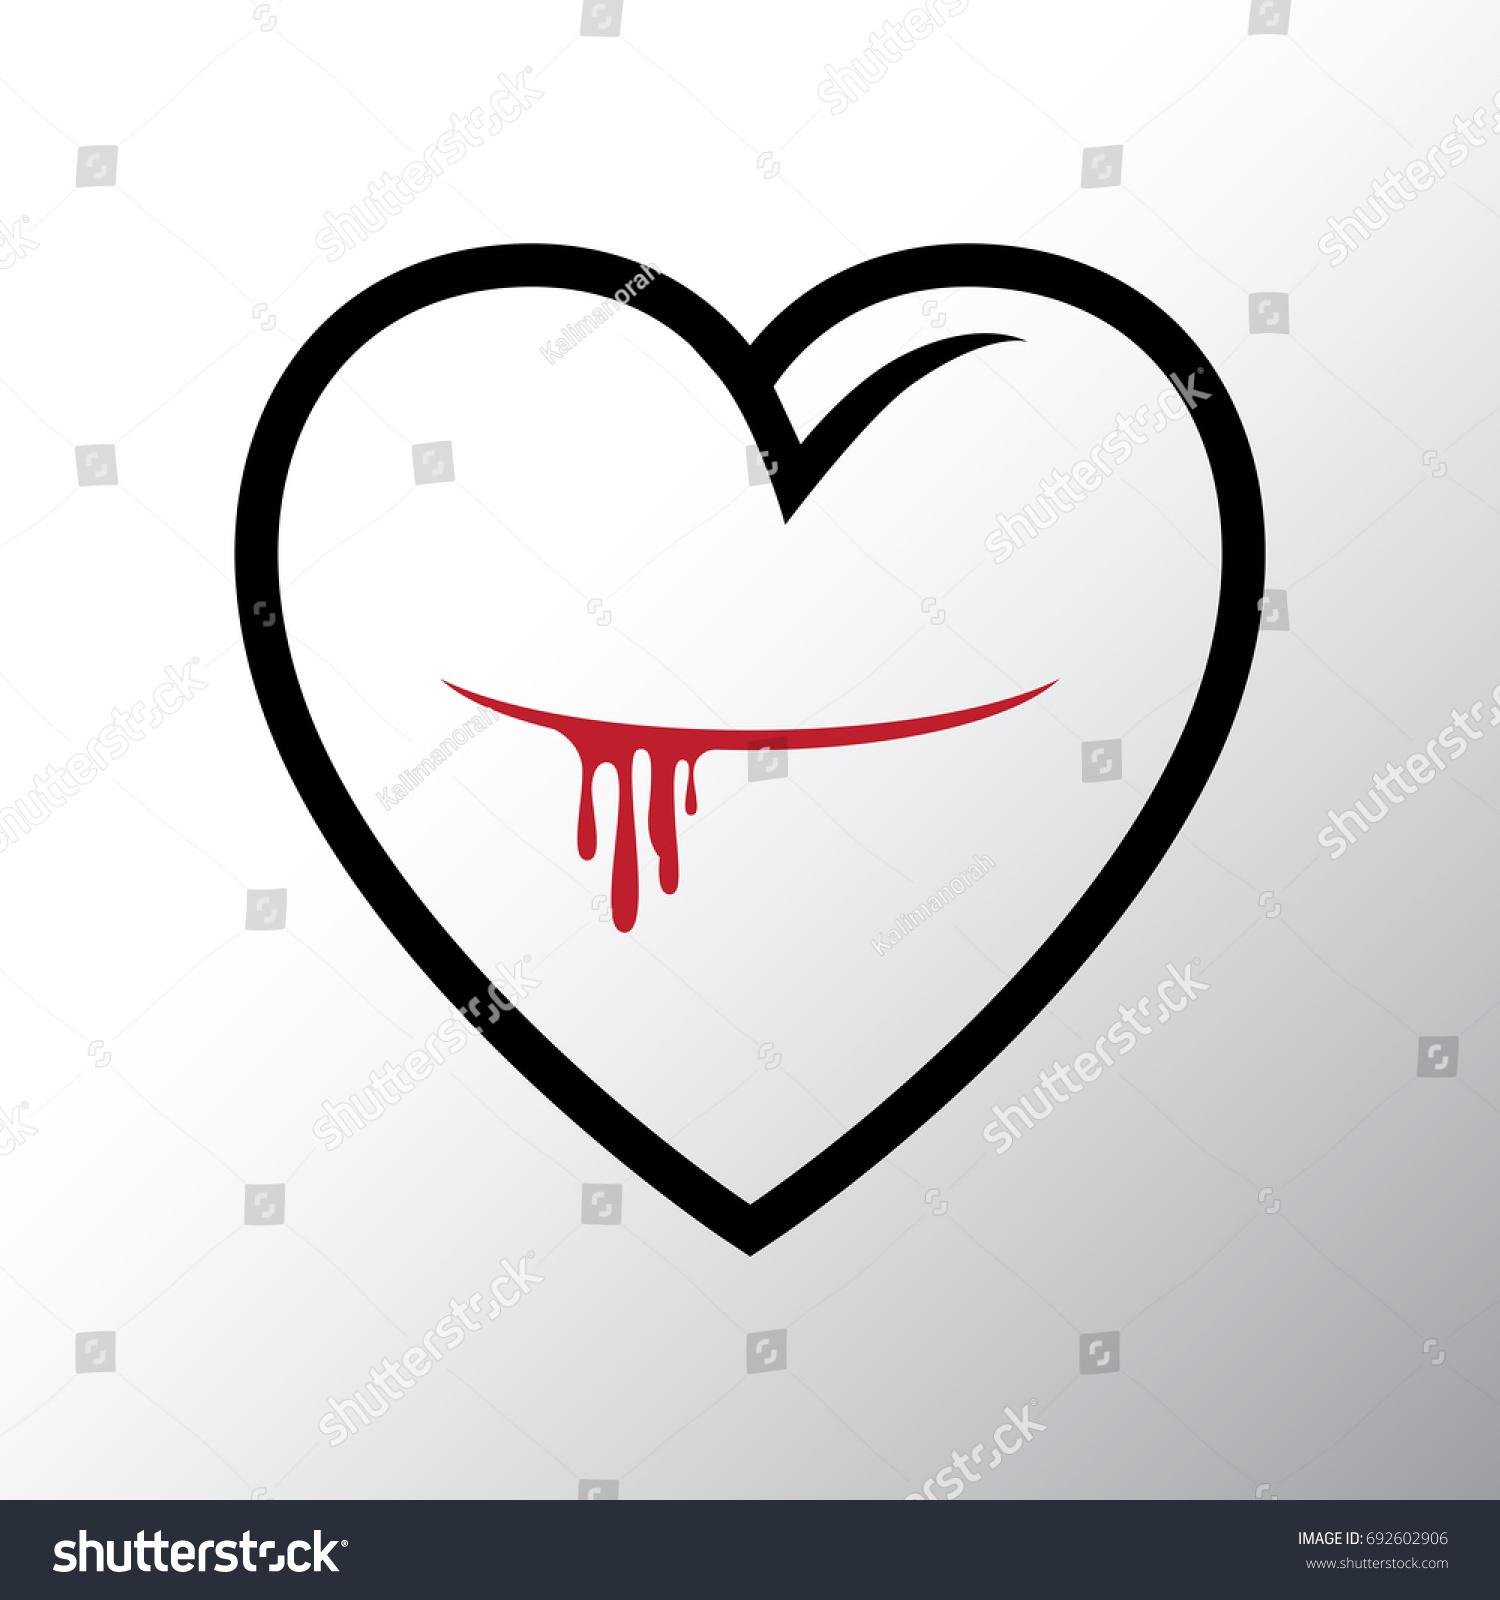 Bleeding heart logo stock vector 692602906 shutterstock bleeding heart logo buycottarizona